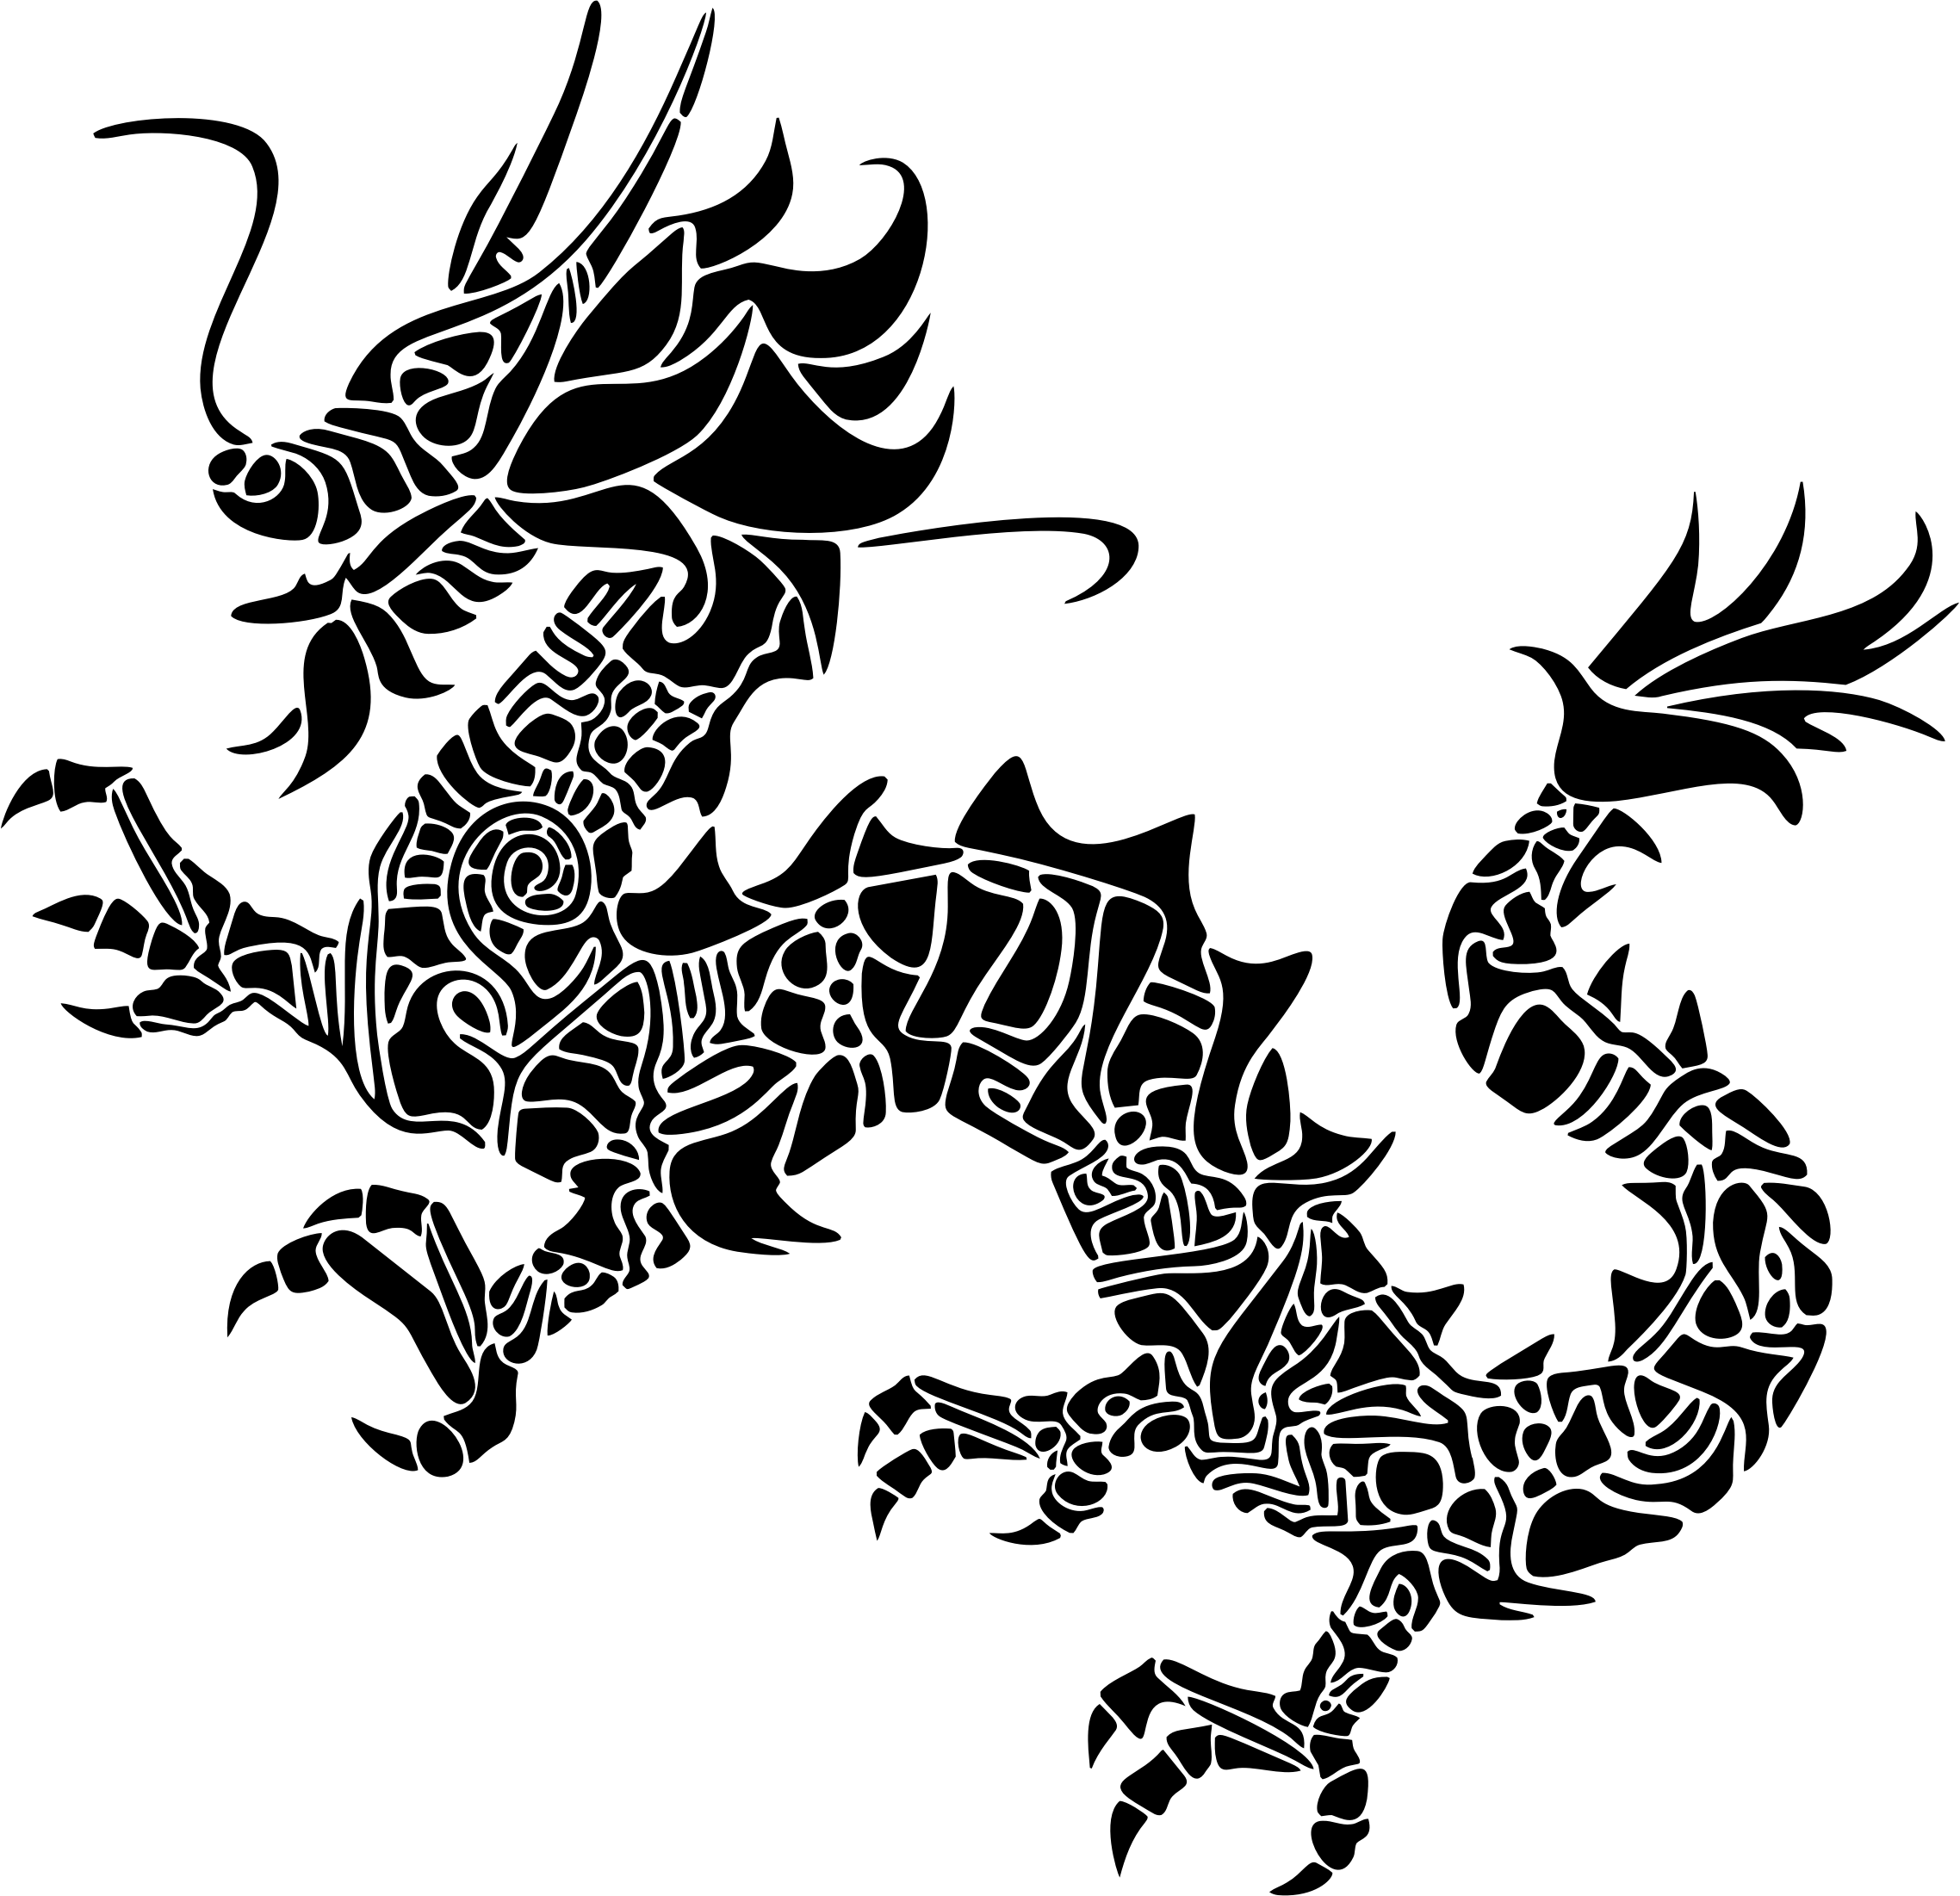 Tribal asian silhouette big. Clipart dragon stencil